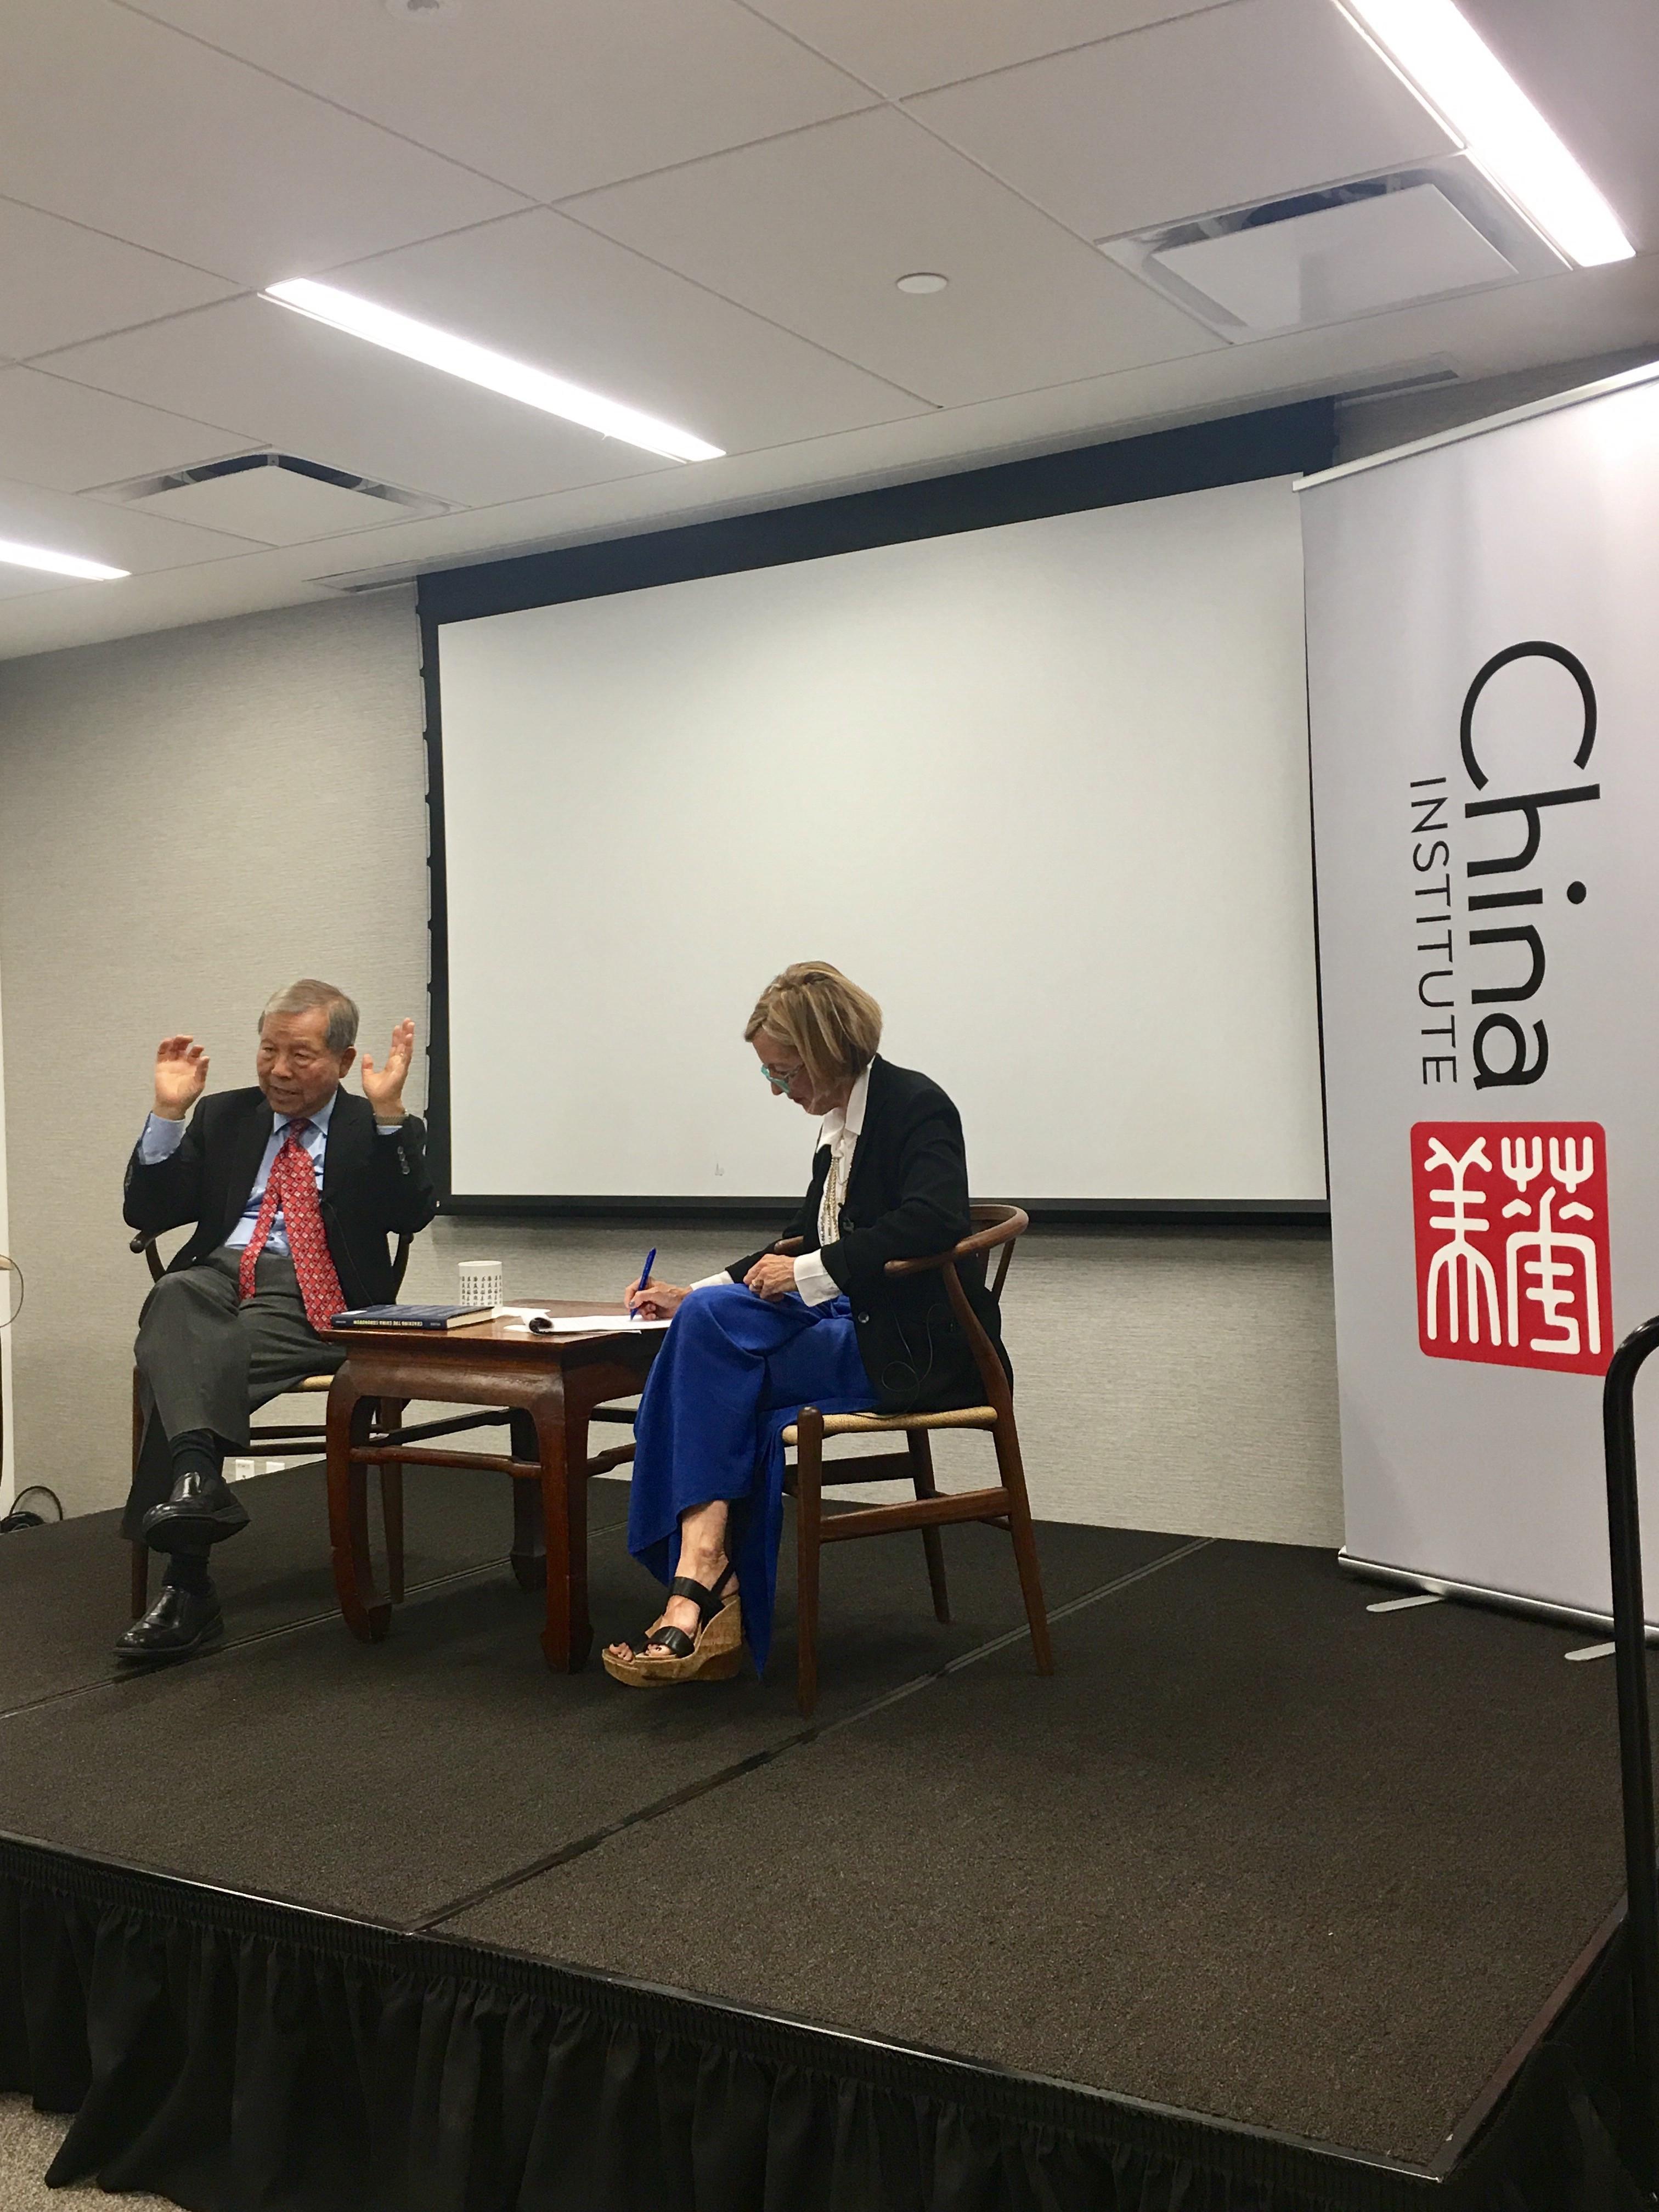 Caption: Yukon Huang (left) and Dorinda Elliott (right) at China Institute, Sep. 7, 2017